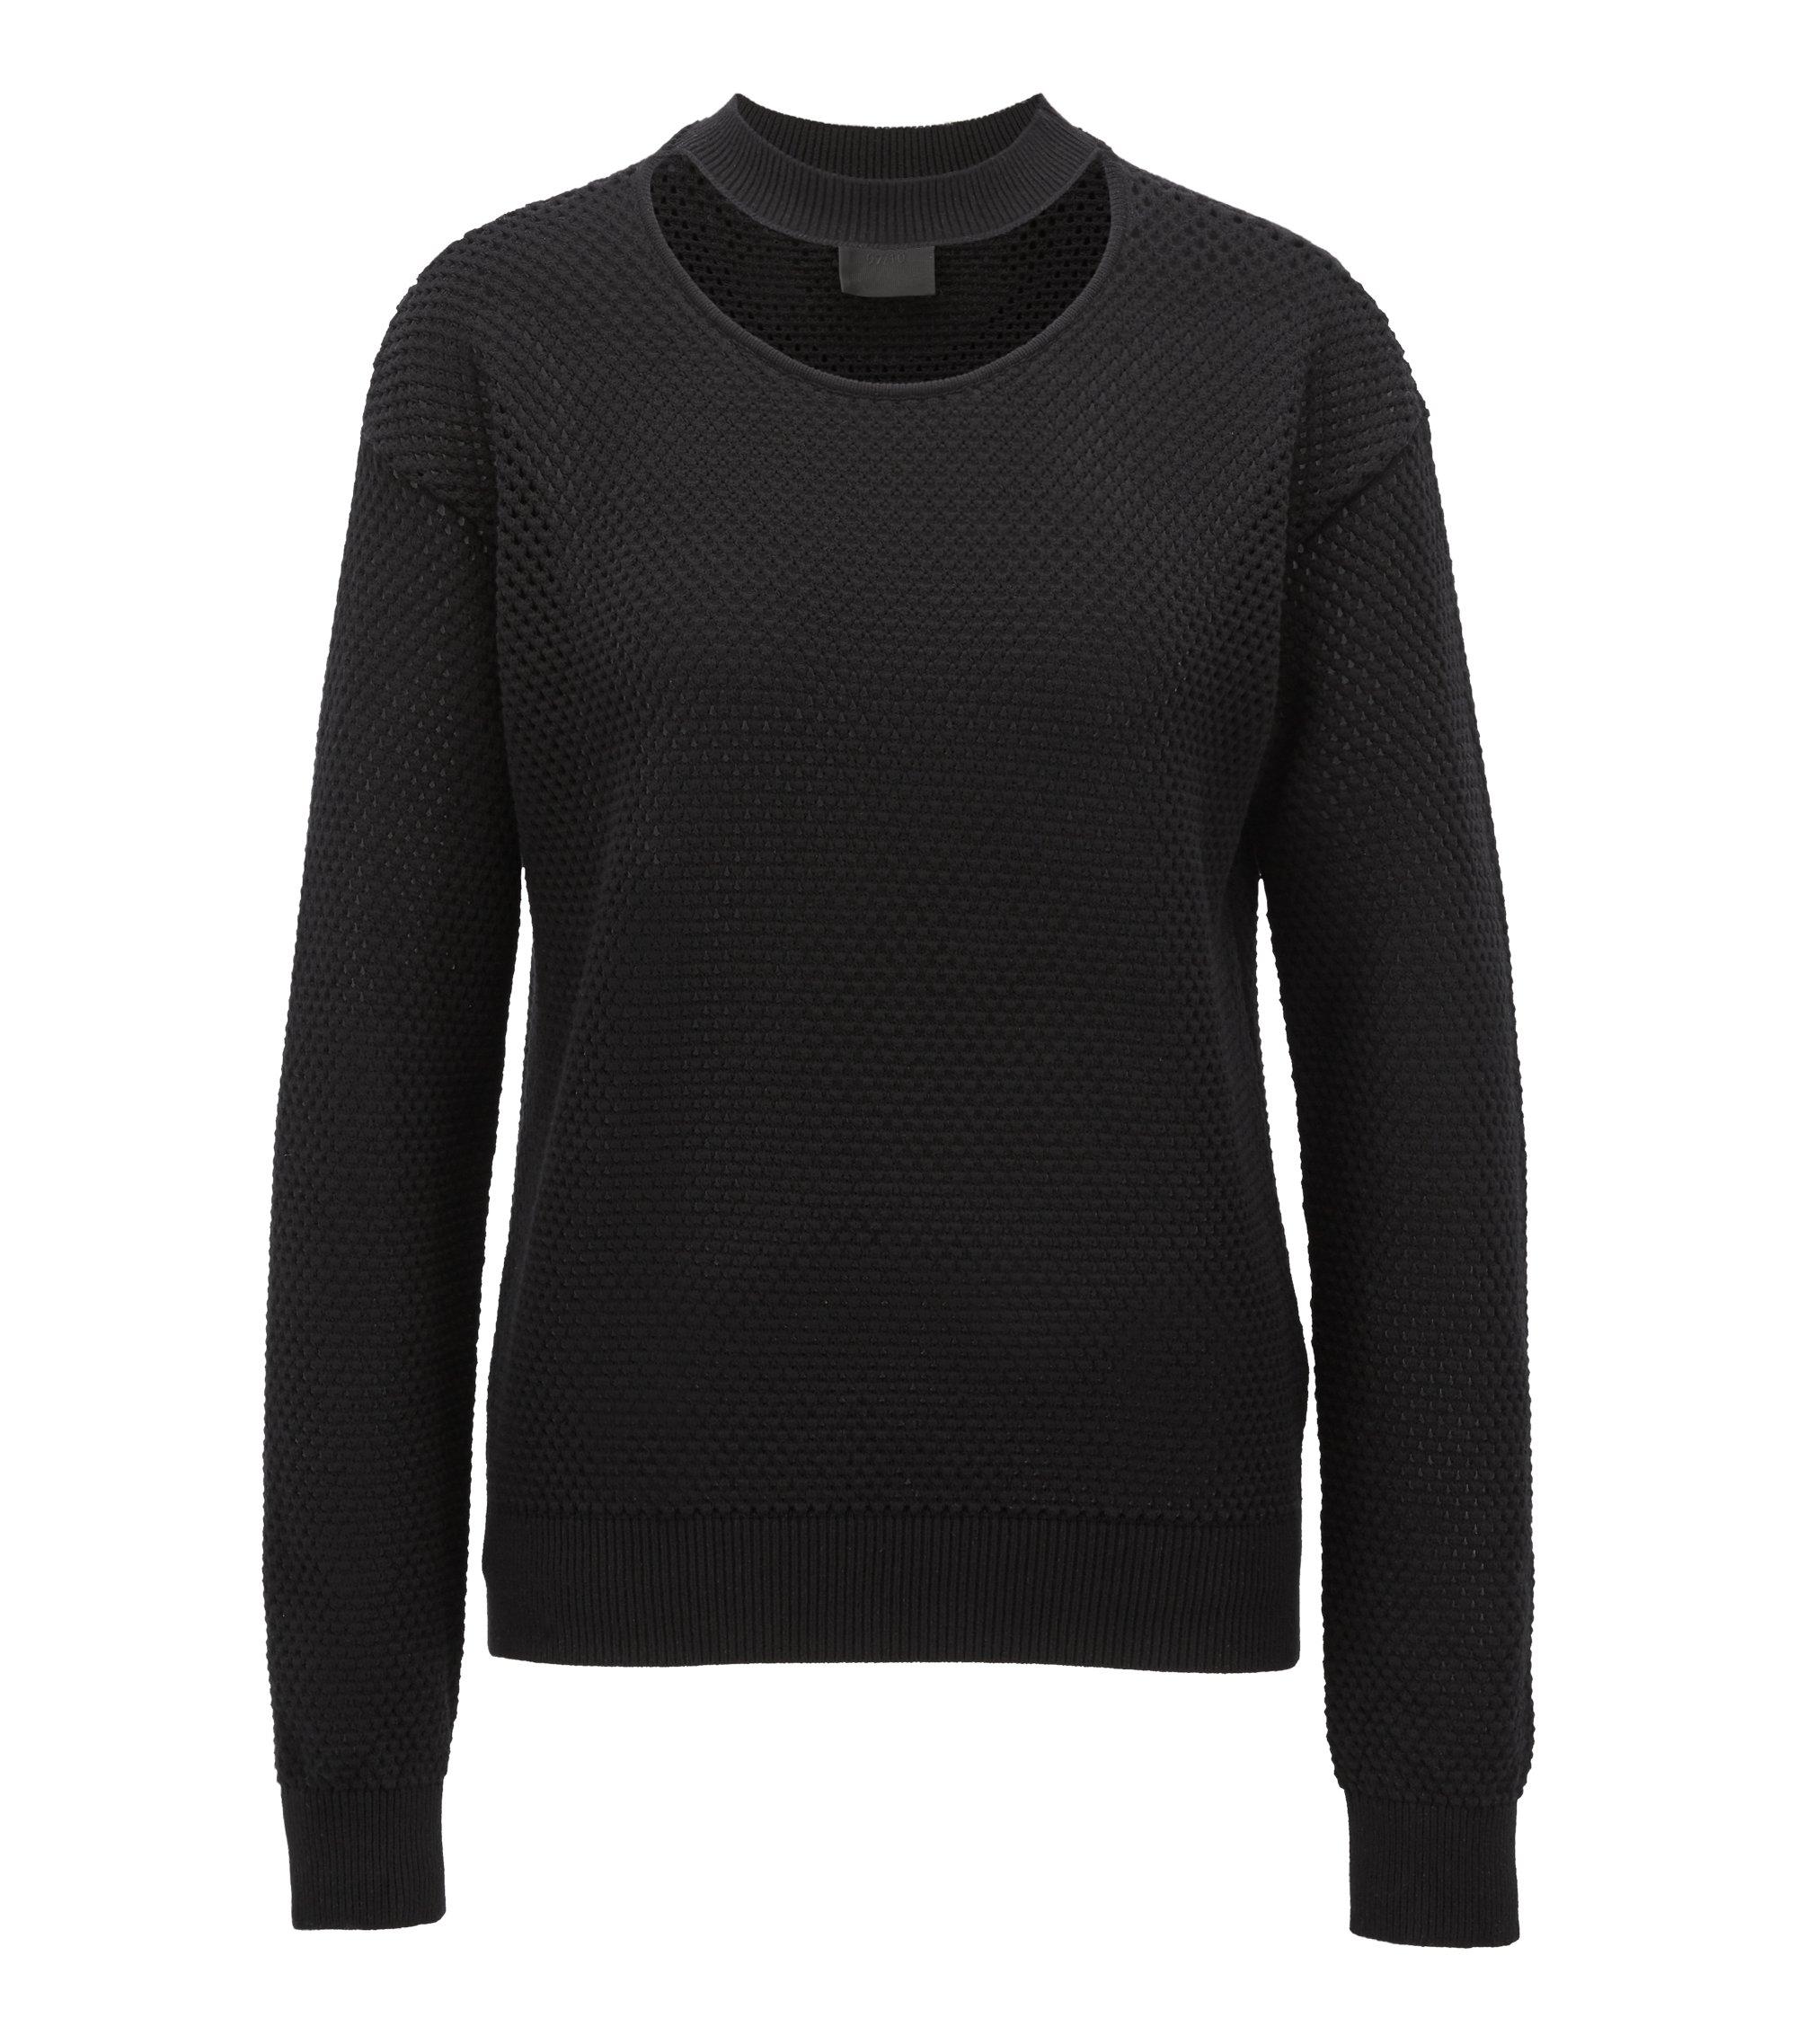 Cutout-detail neckline sweater in stretch mesh, Black